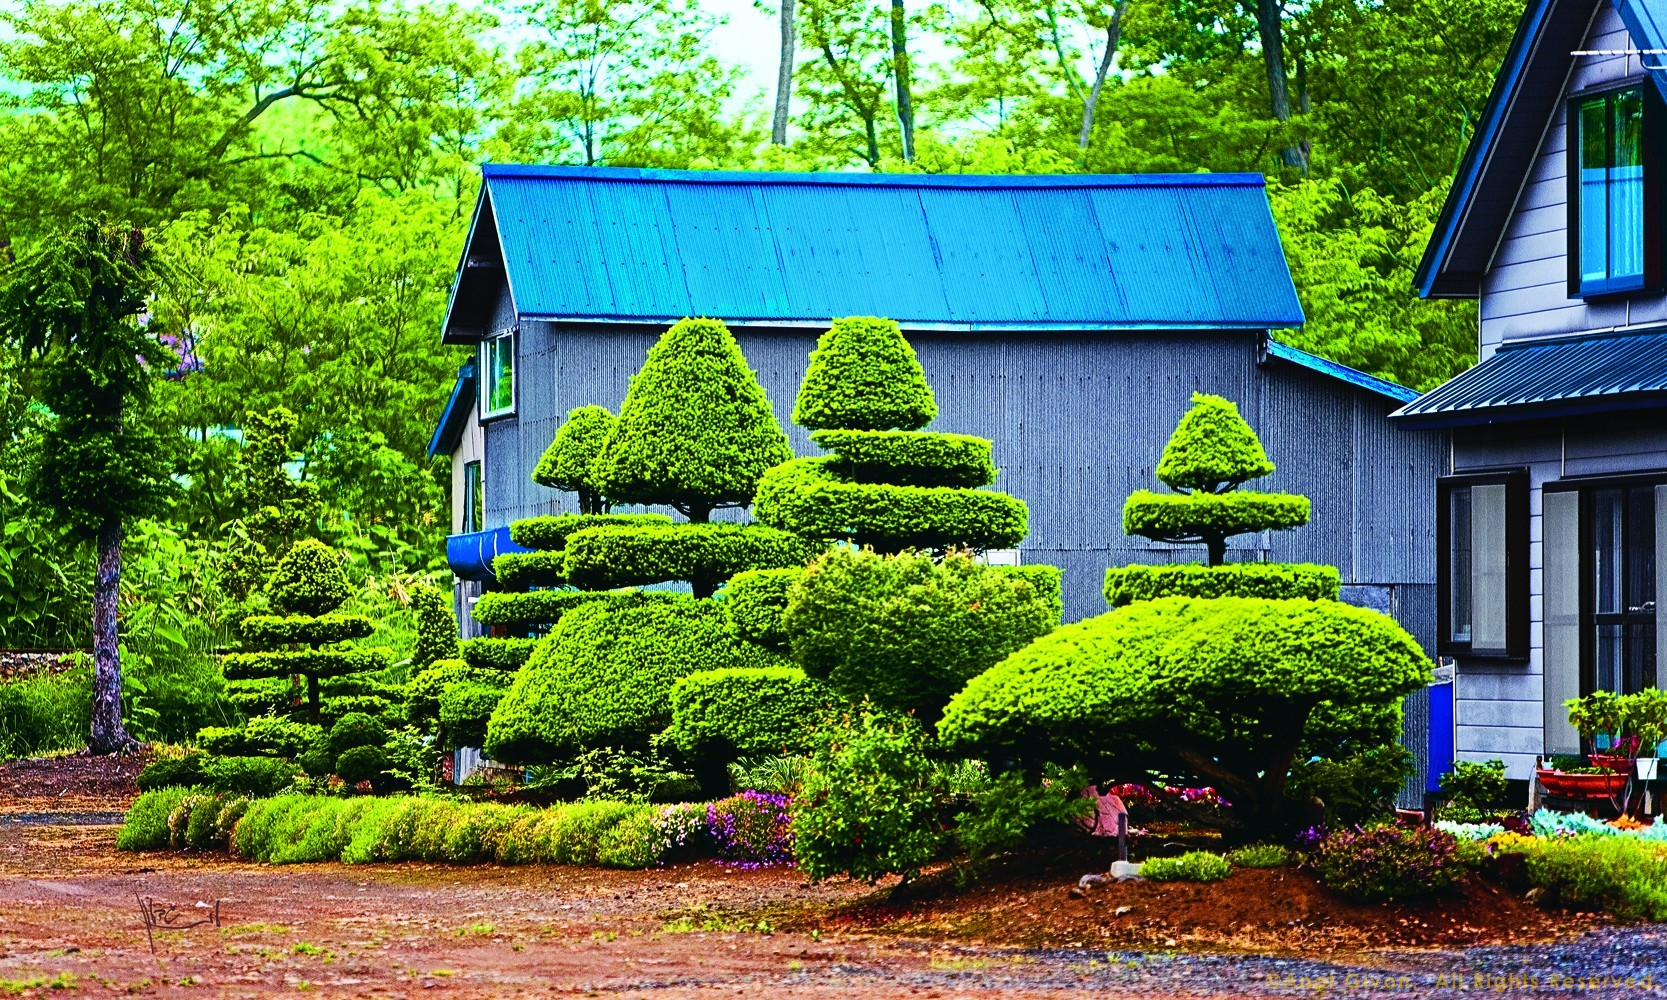 Bonzai Garden, Hokkaido, Japan